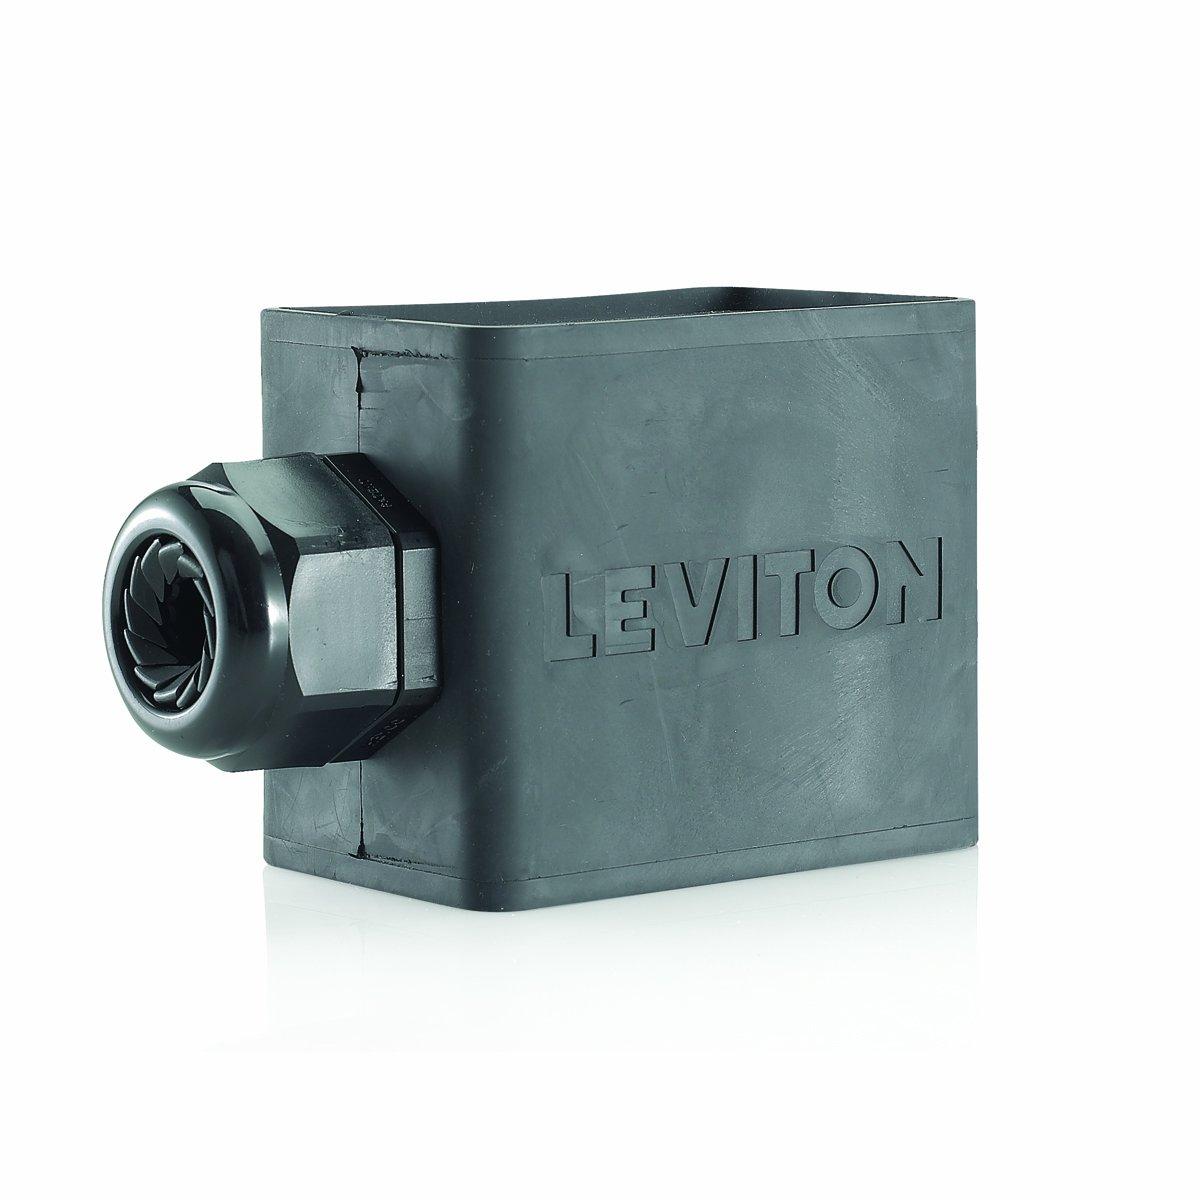 Leviton 3059-2E Portable Outlet Box, Single-Gang, Standard Depth, Pendant Style, Cable Diameter 0.590-Inch 1.000-Inch, Black